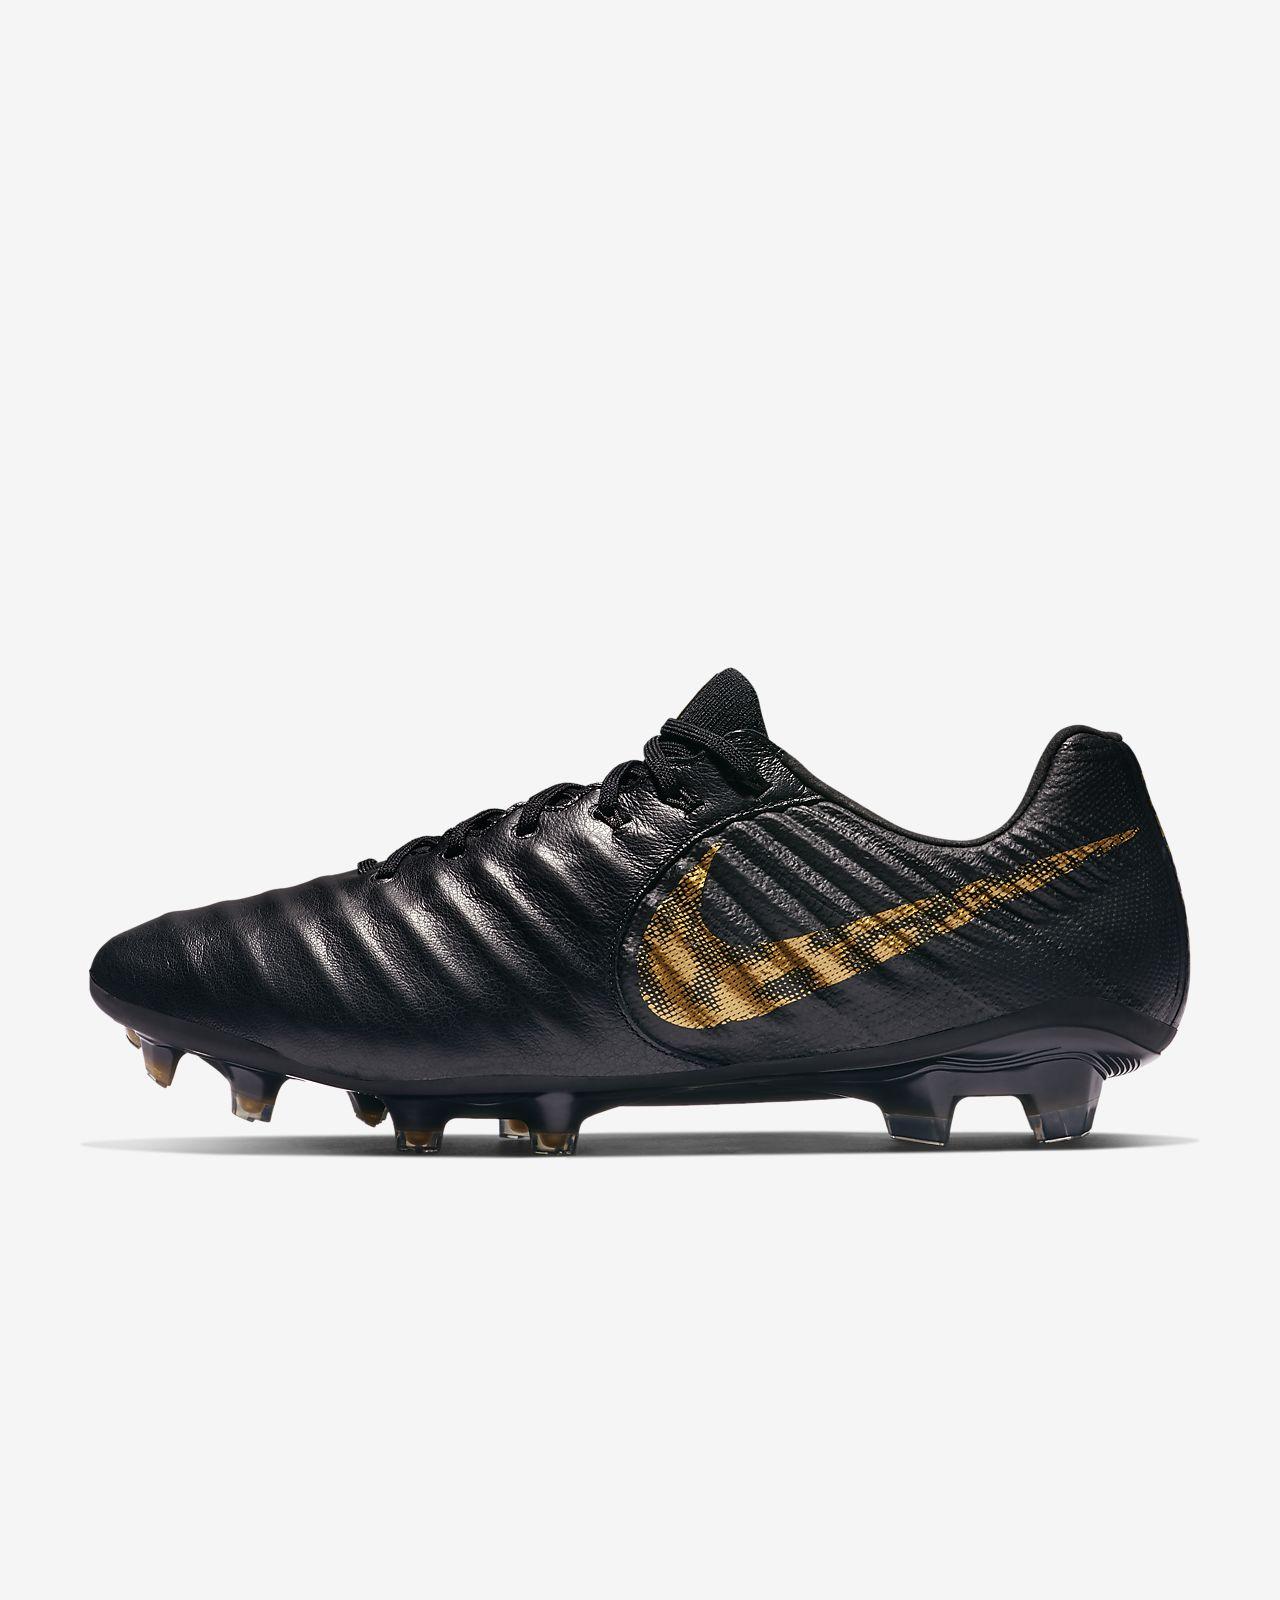 Nike Tiempo Legend 7 Elite FG Firm-Ground Soccer Cleat